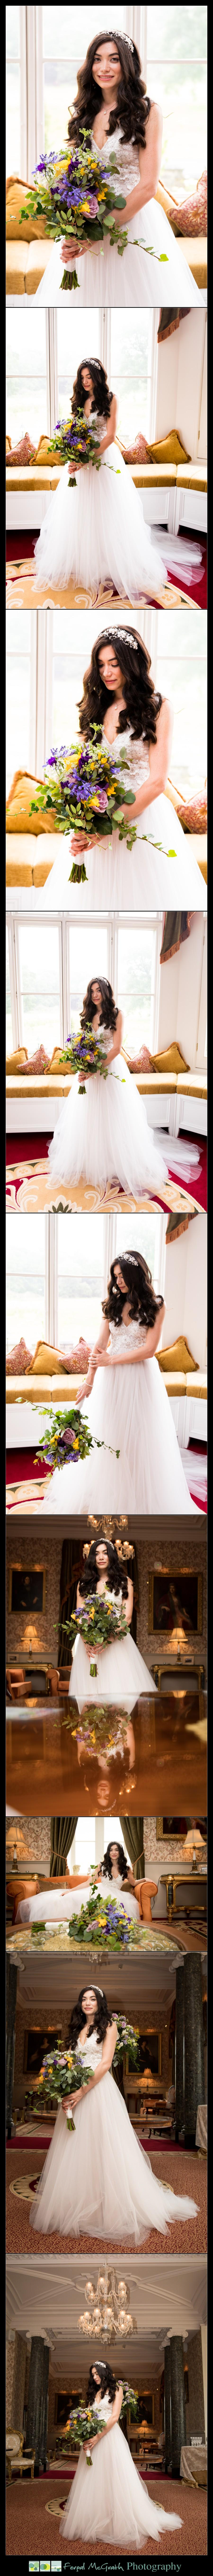 Markree Castle Wedding stunning sligo bride in the castle